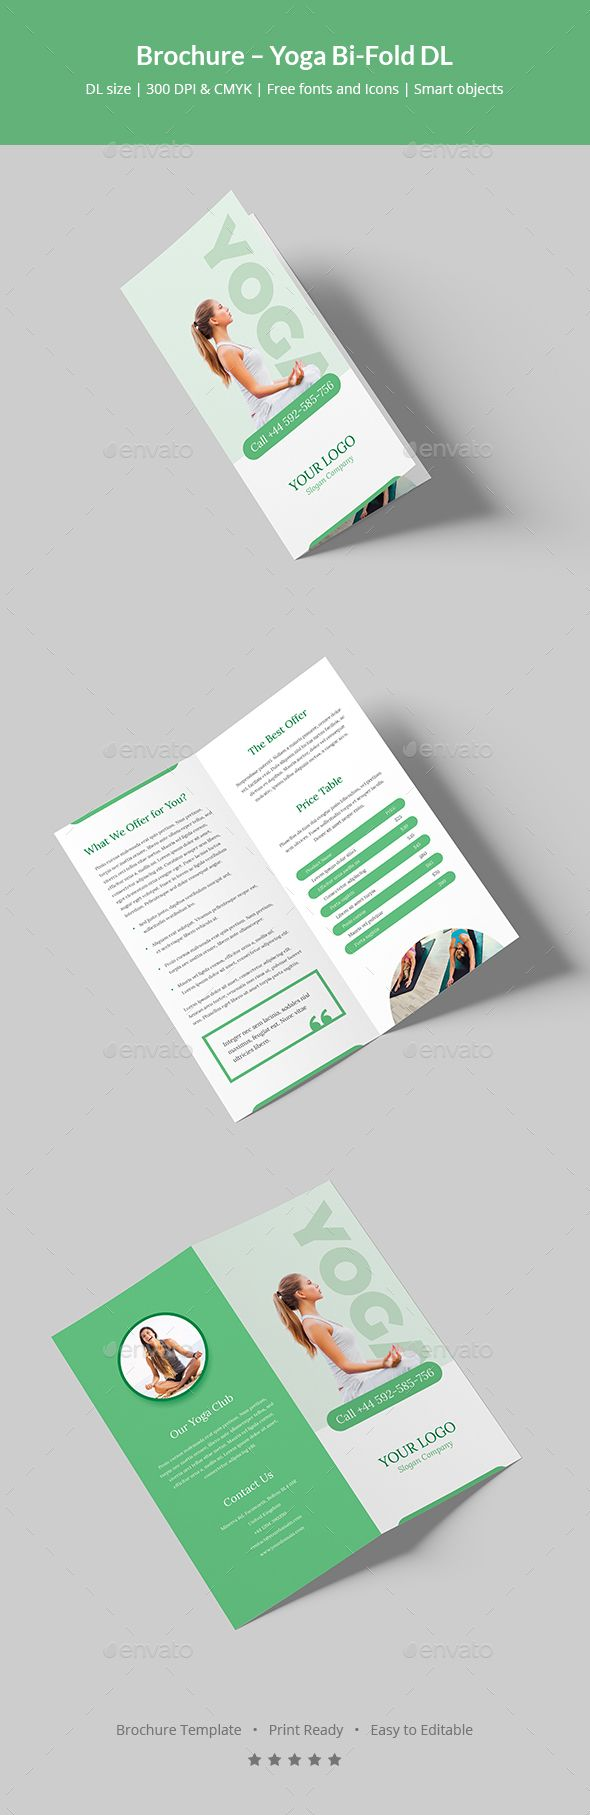 Brochure – Yoga Bi-Fold DL | Grafikdesign